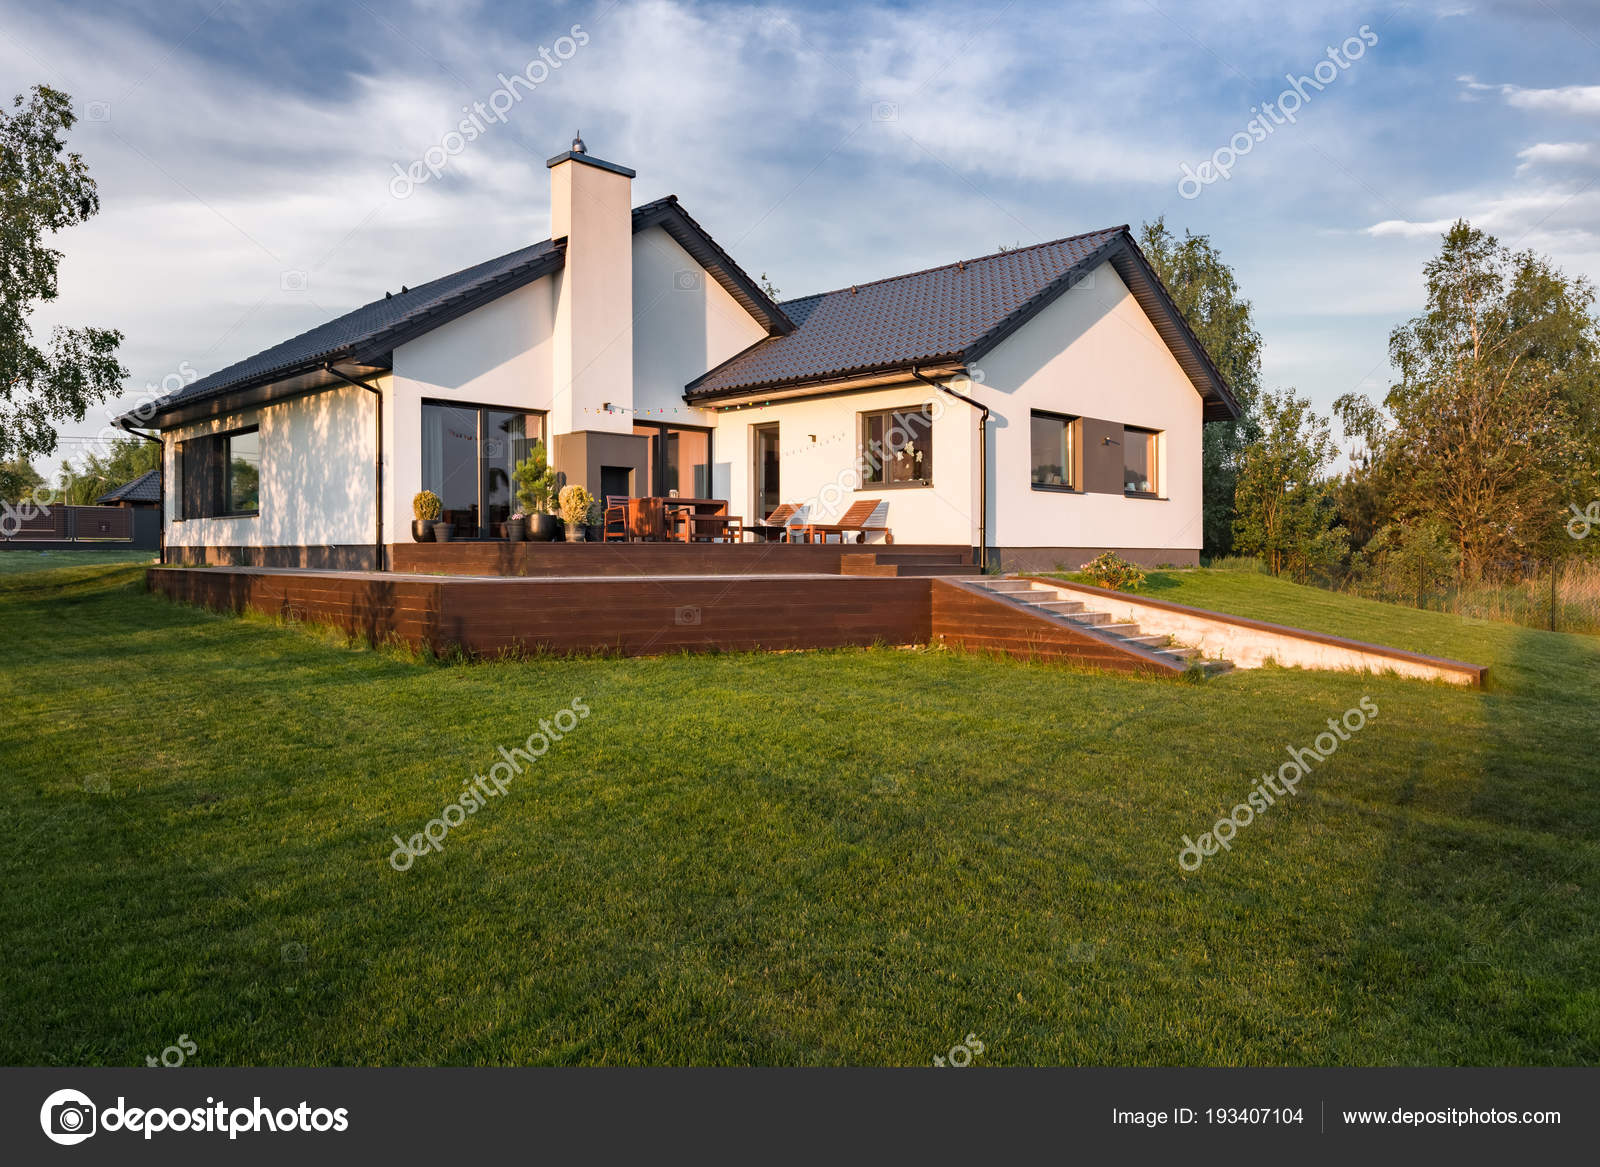 Maison moderne avec patio — Photographie in4mal © #193407104